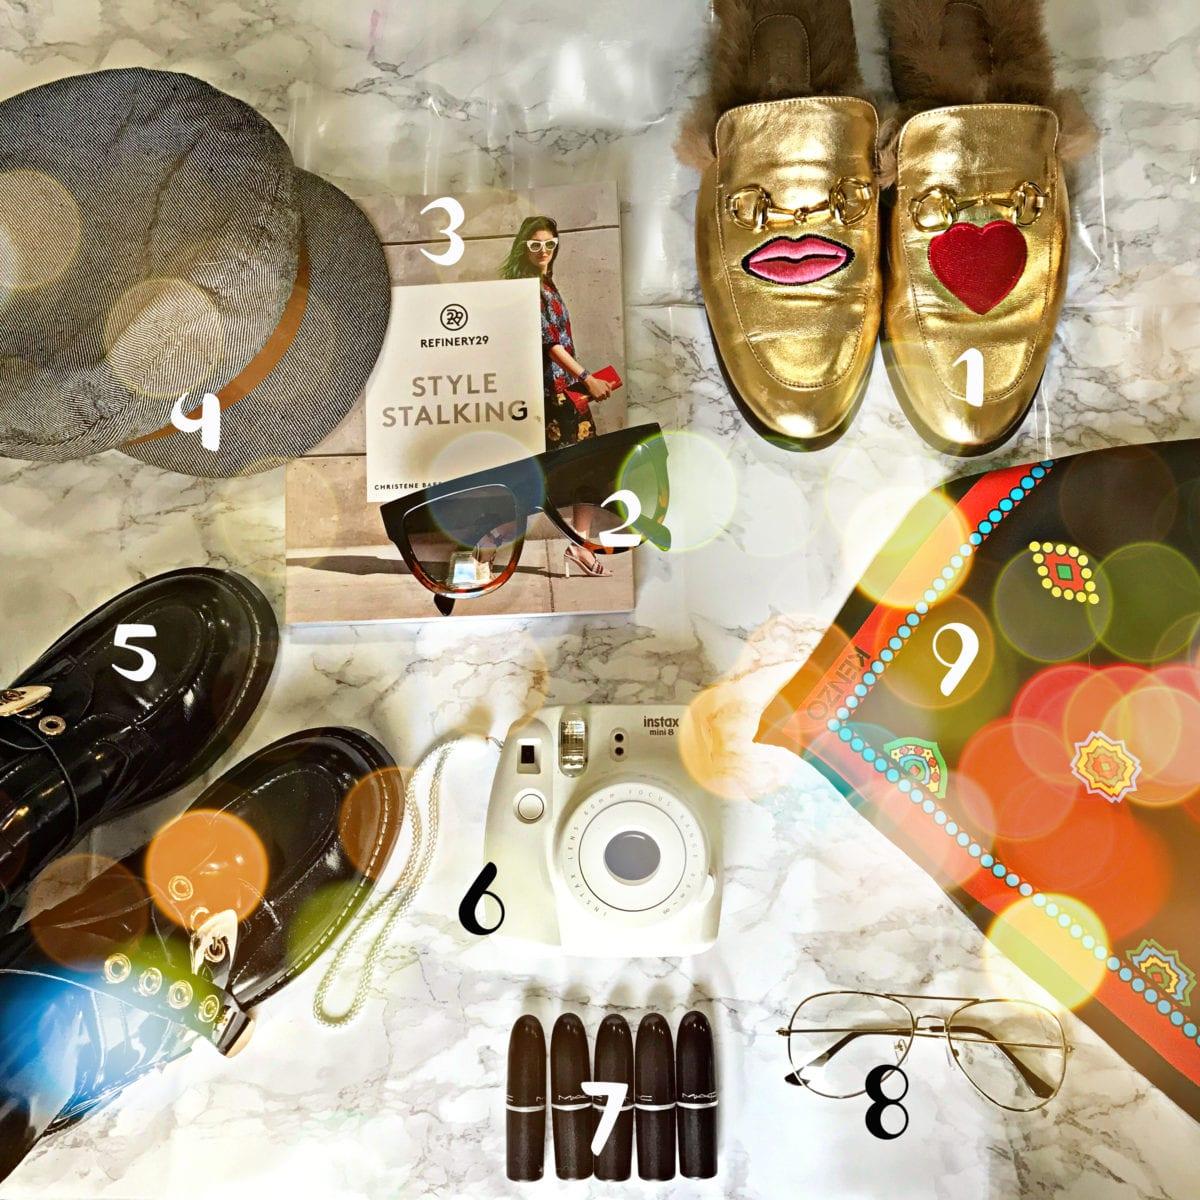 The FASHIONISTA's Gift Guide: All Your Designer Wannabe Favorites under $160- BloggerNotBillioniare